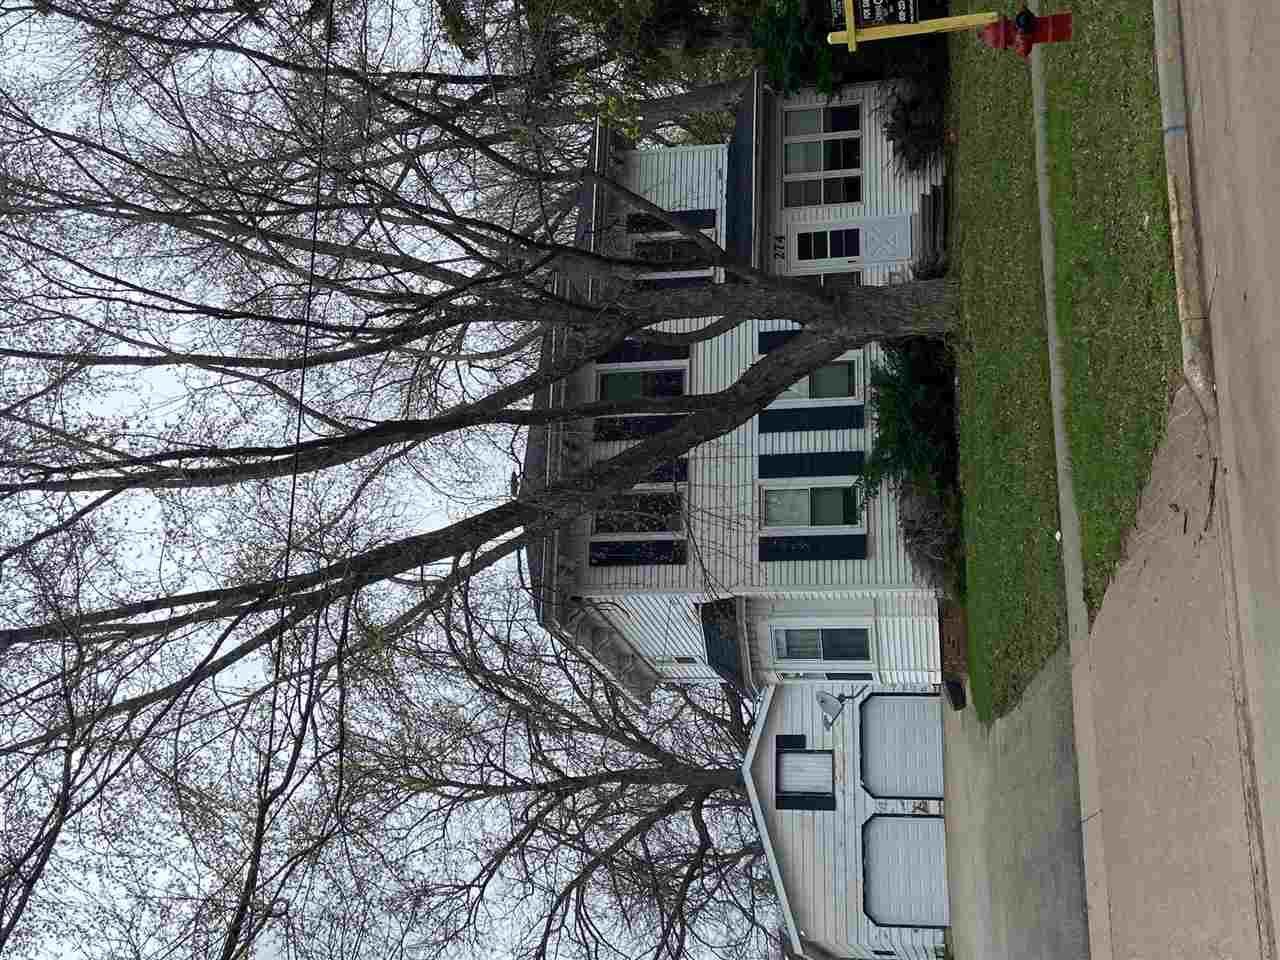 274 S Janesville St, Whitewater, WI 53190 - #: 1900543